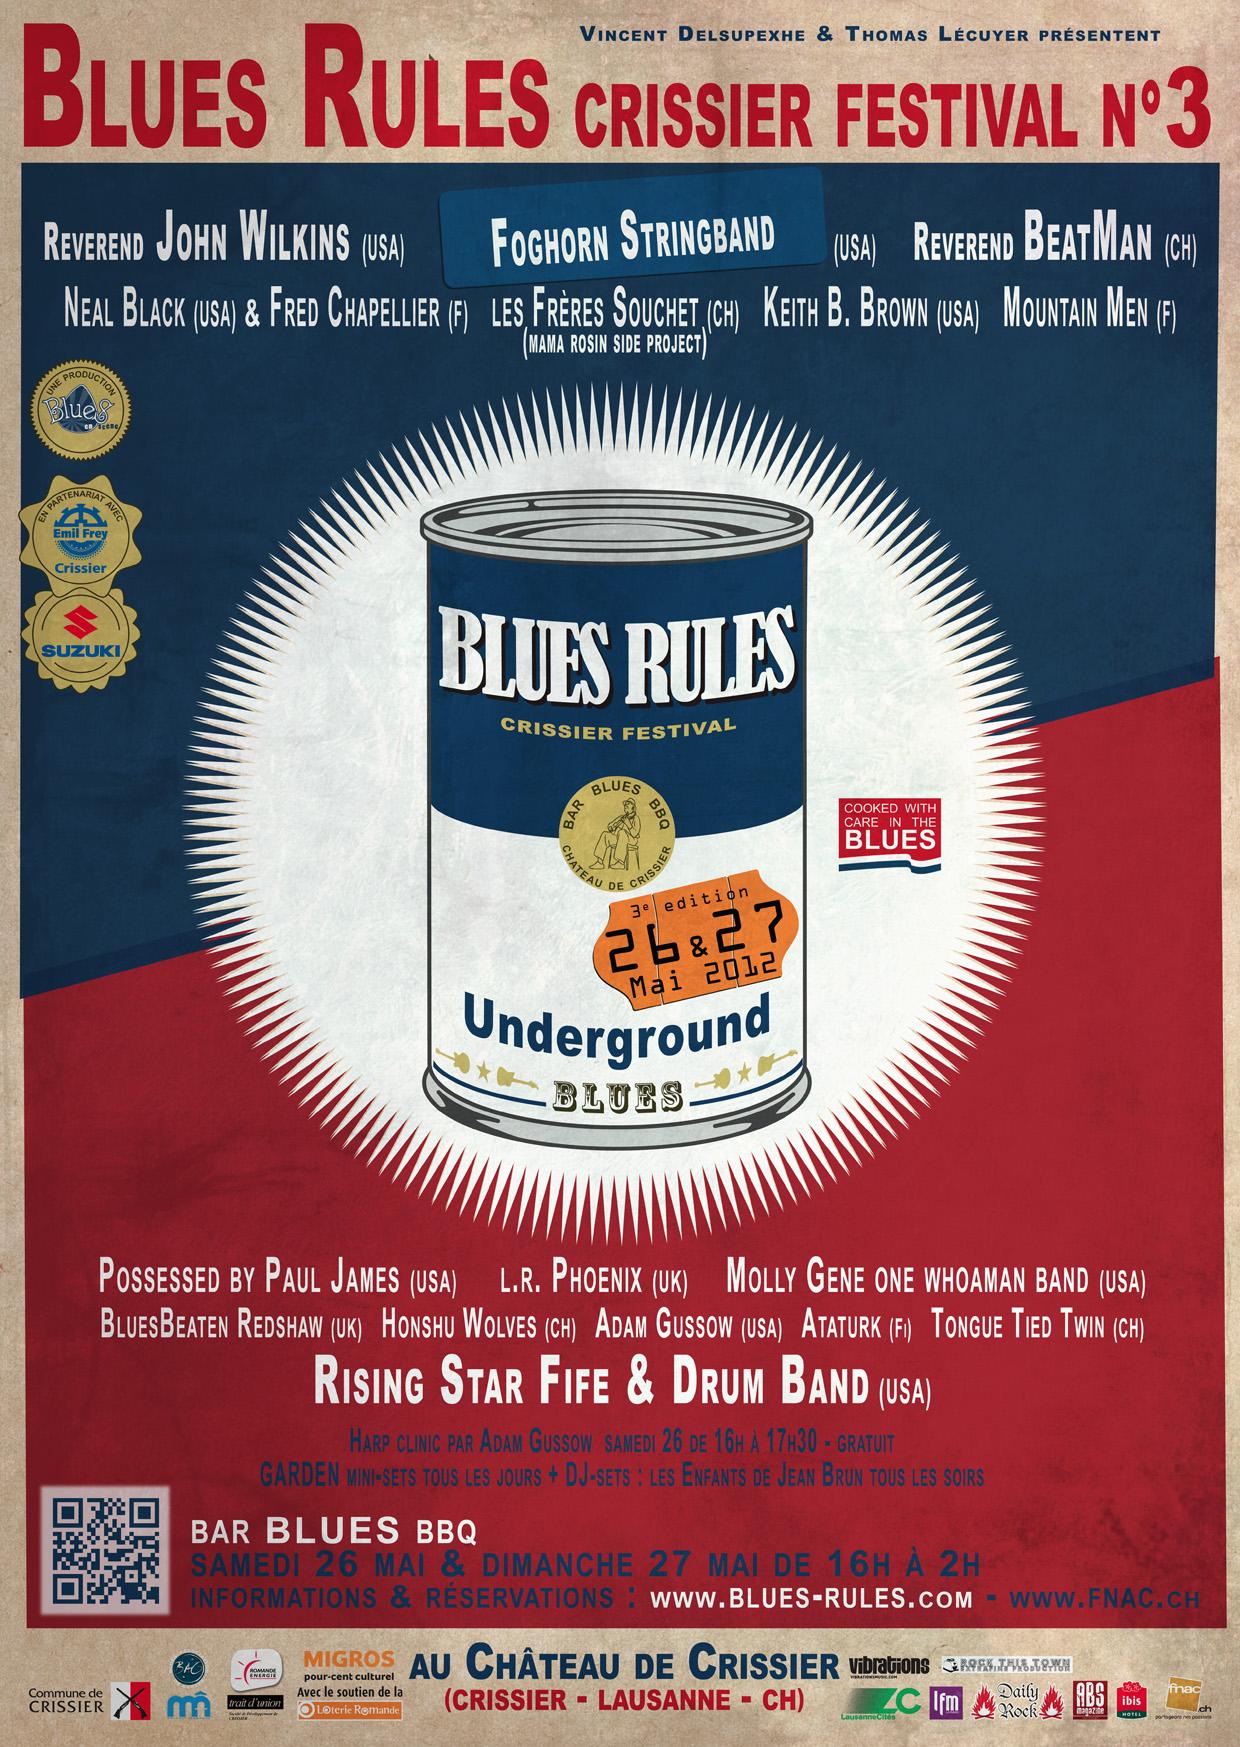 Blues Rules Crissier Festival n°3 - Page 2 BR3_modif